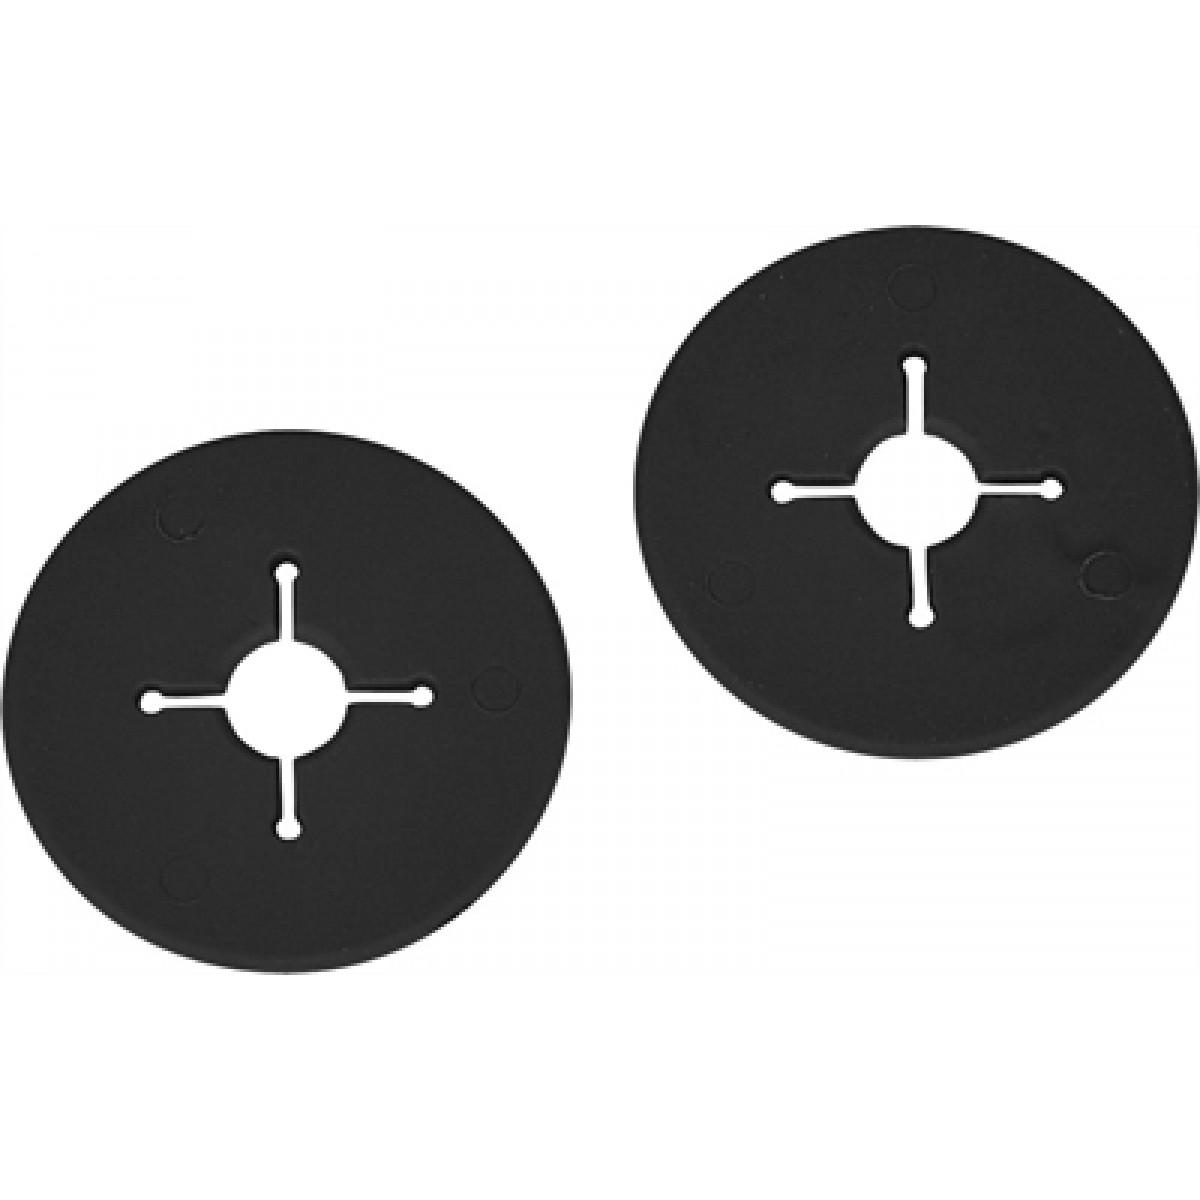 Bidskiver - gummi - 90 mm